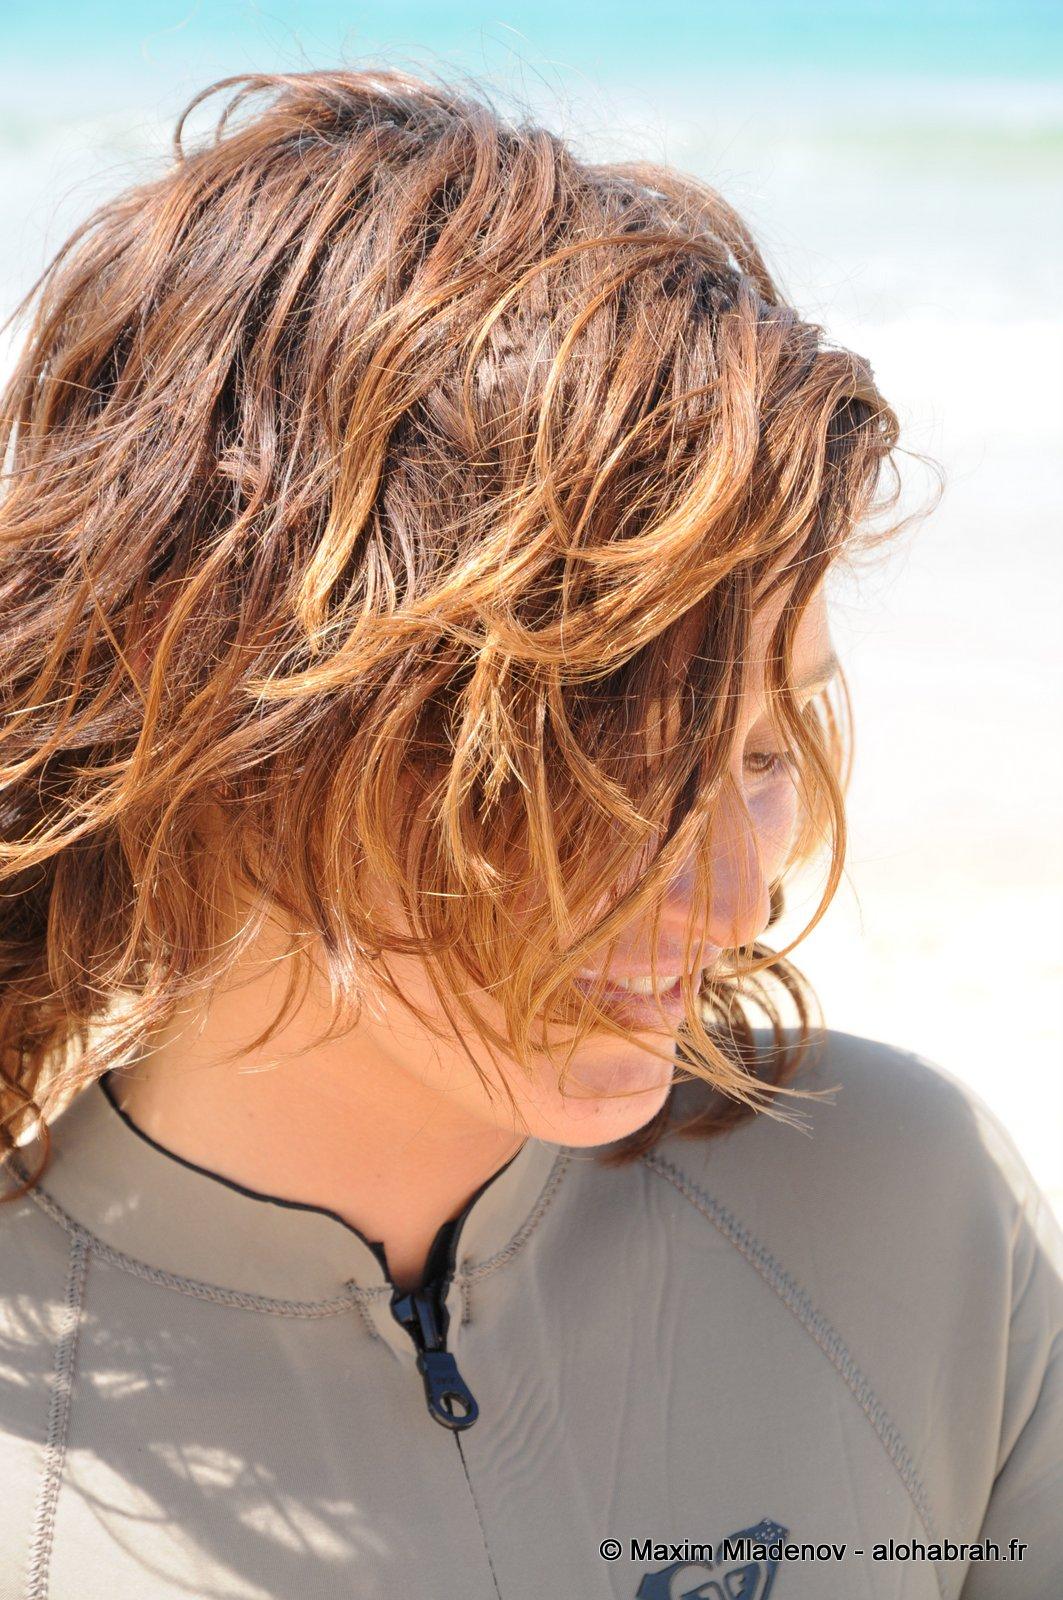 Hair style by Kassia Meador -SGP2012 © Maxim Mladenov - alohabrah.fr